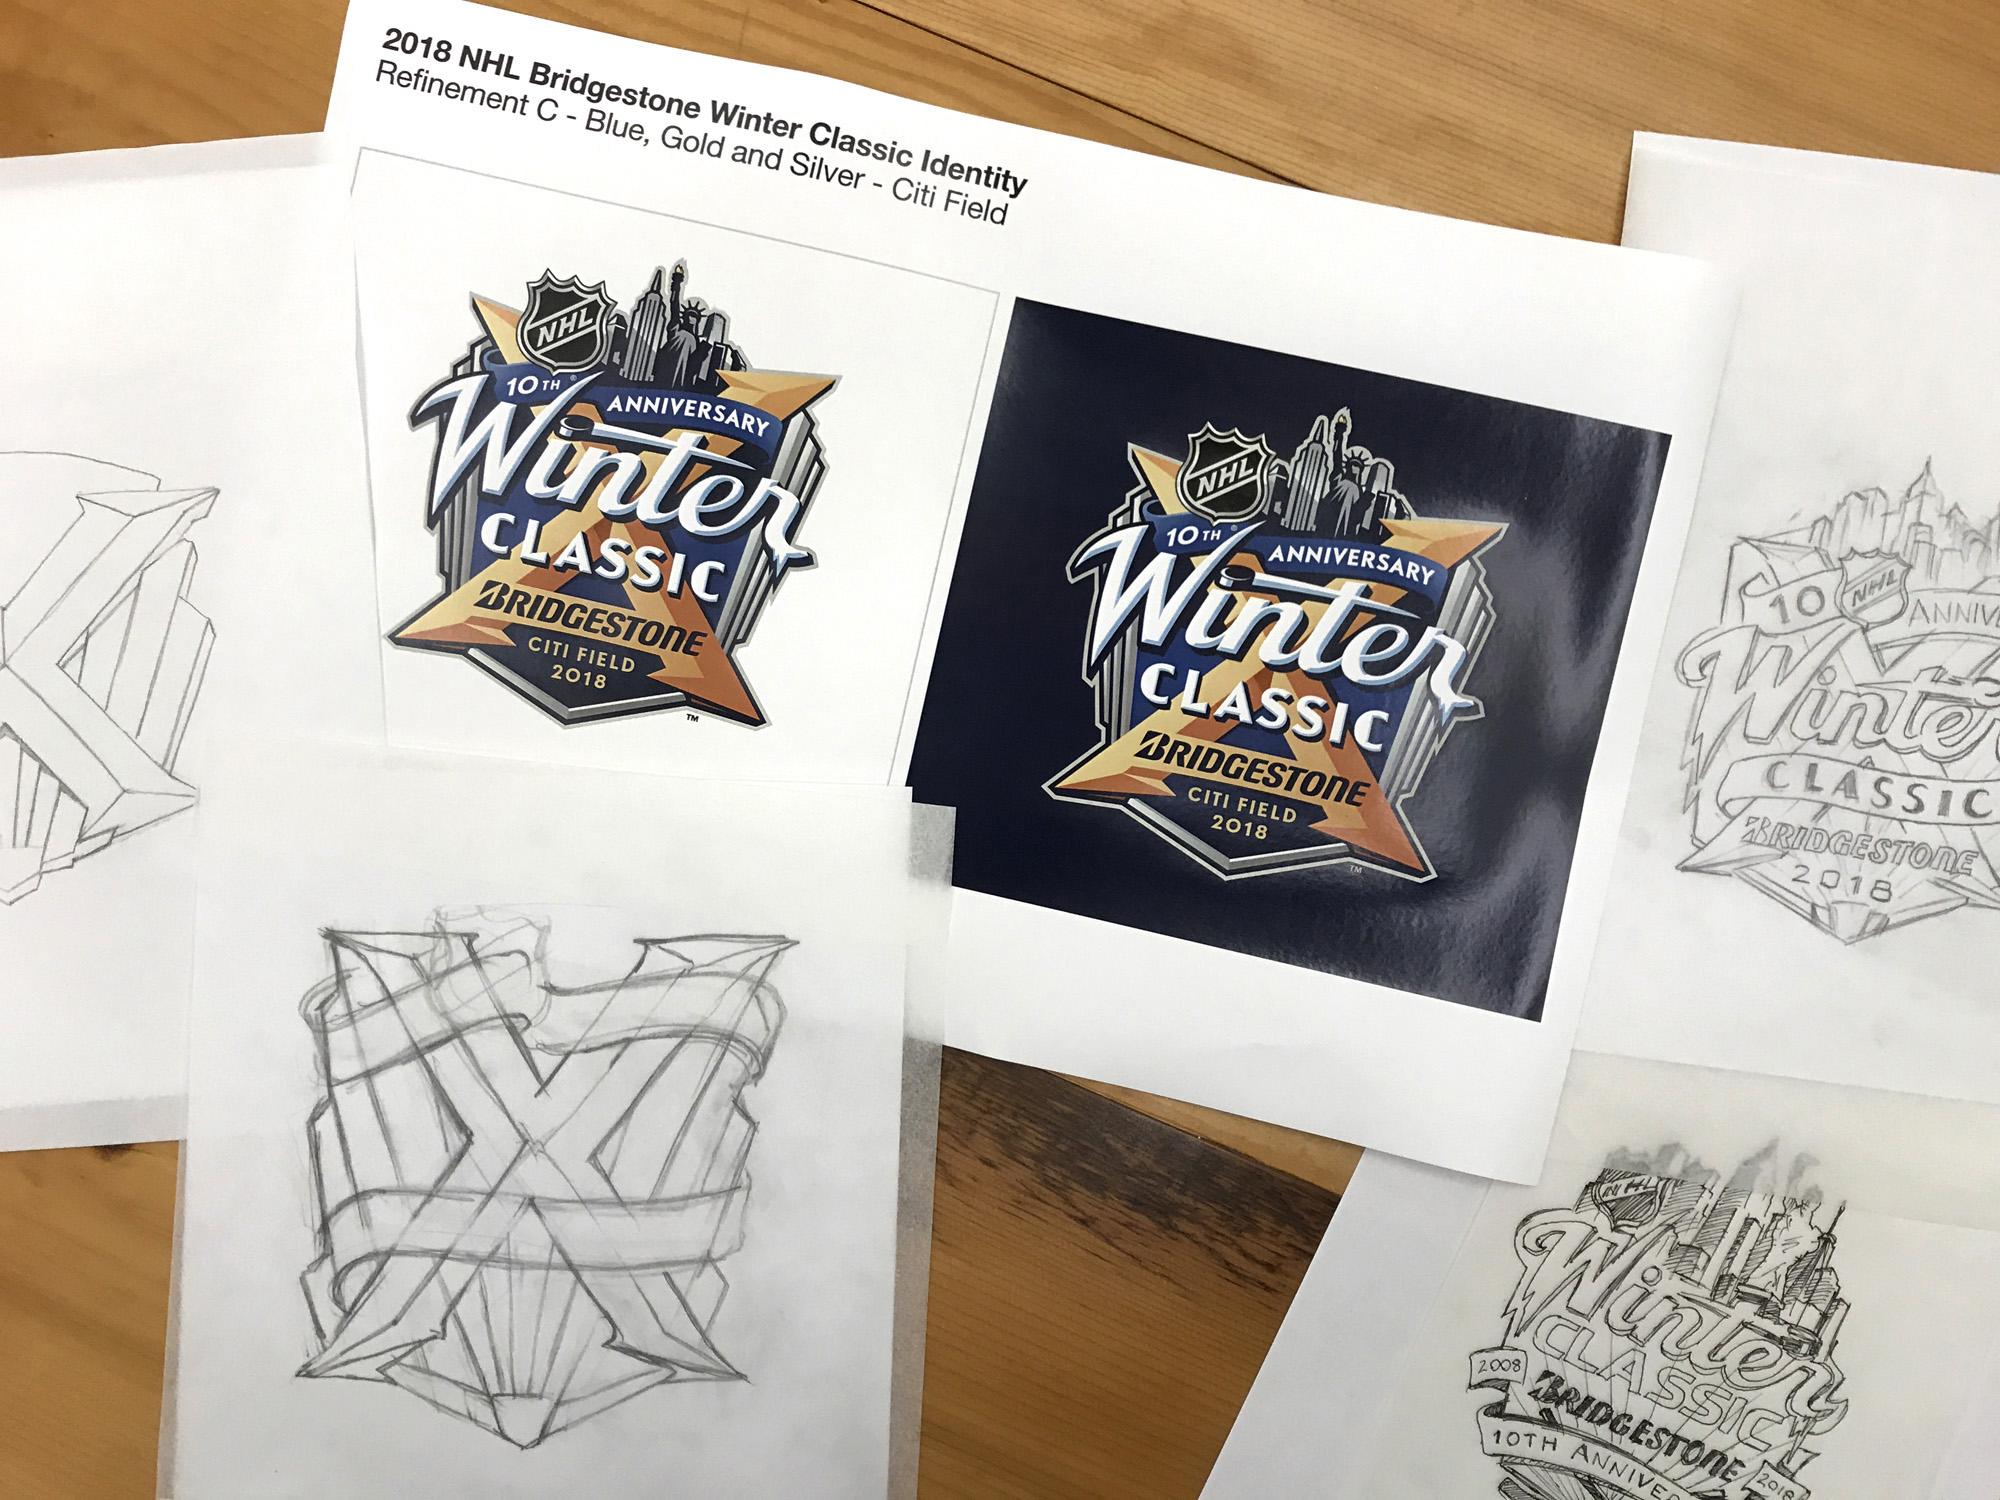 7_WinterClassic_Sketchs_Final 2A.jpg